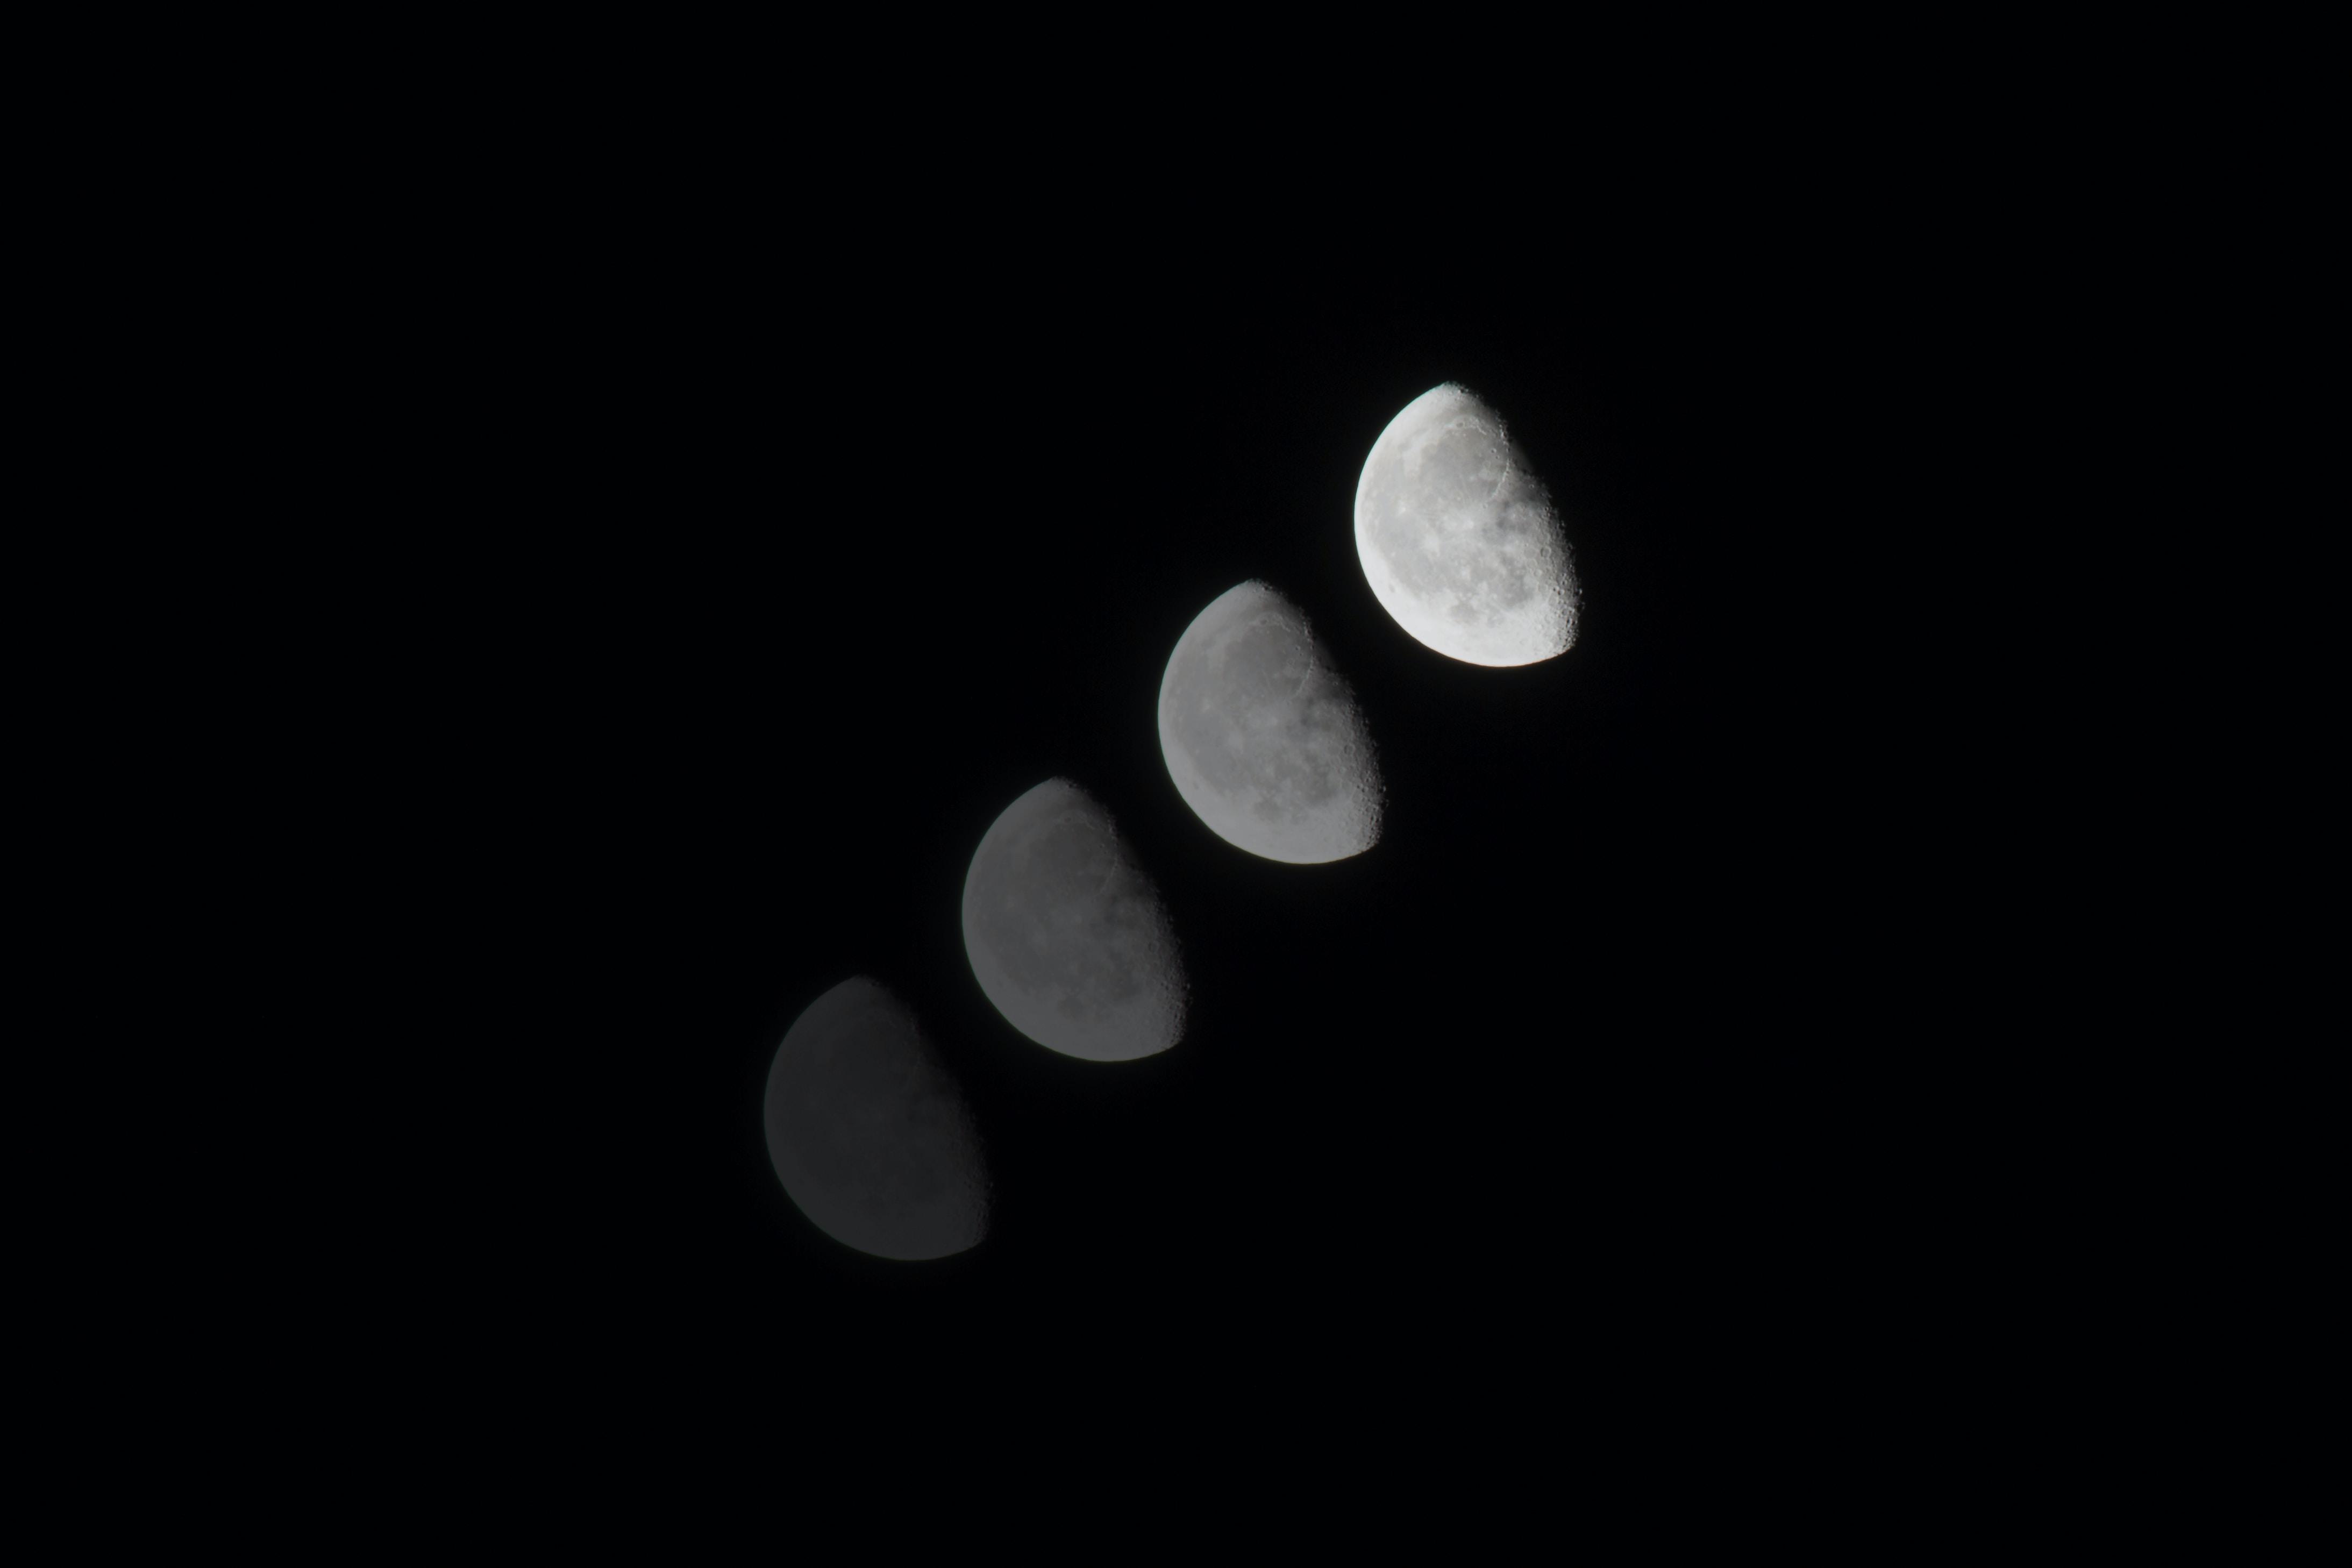 photograph of half moon